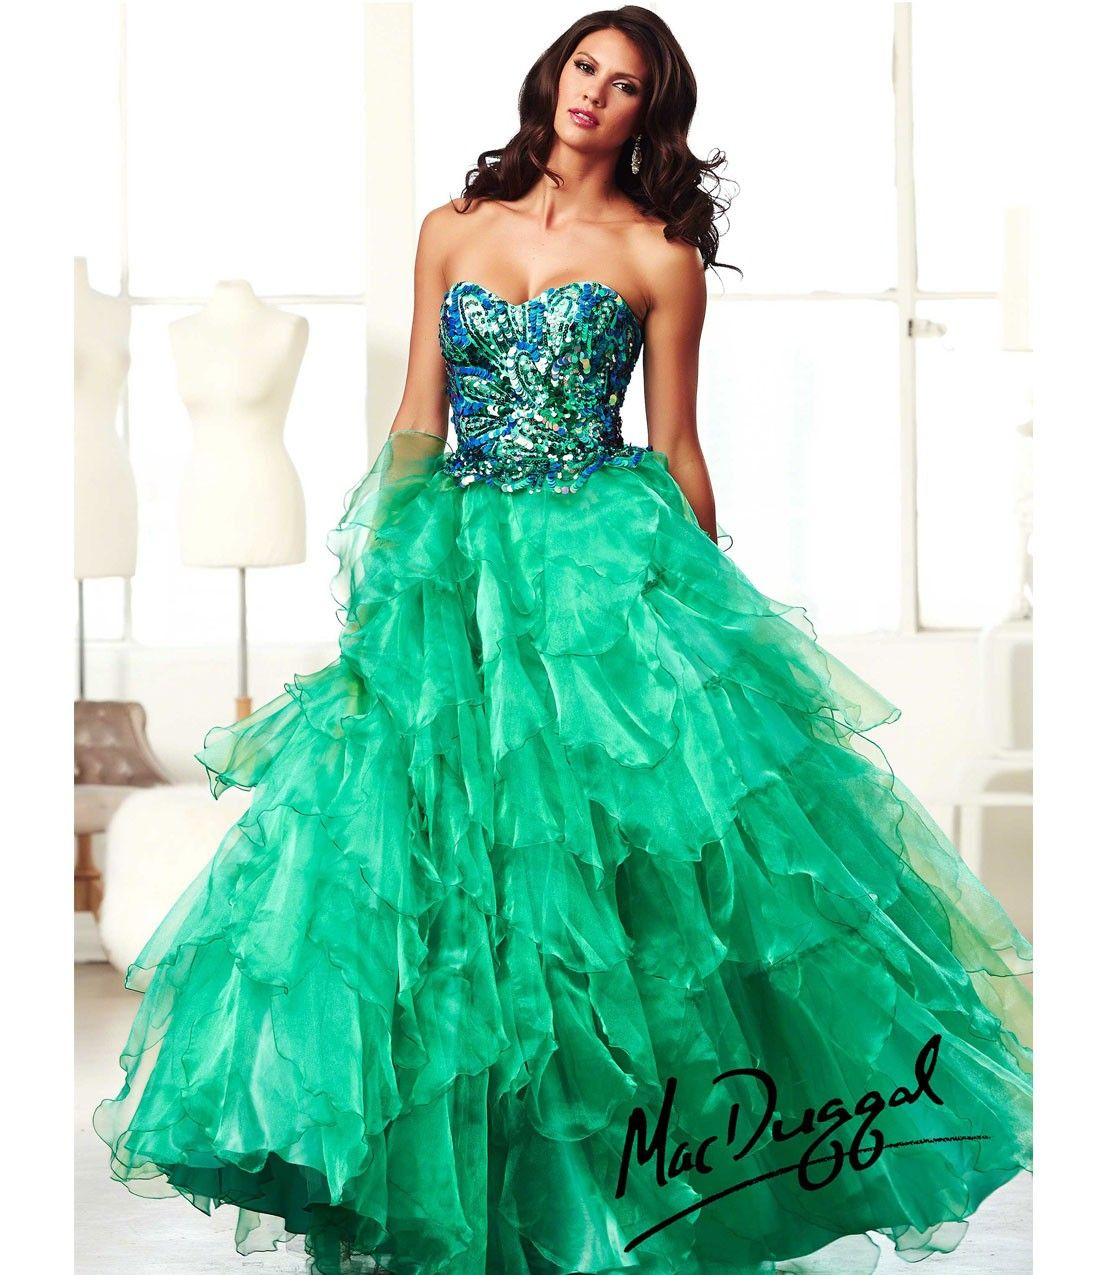 Peacock Color Prom Dress | Coisas para usar | Pinterest | Peacock ...